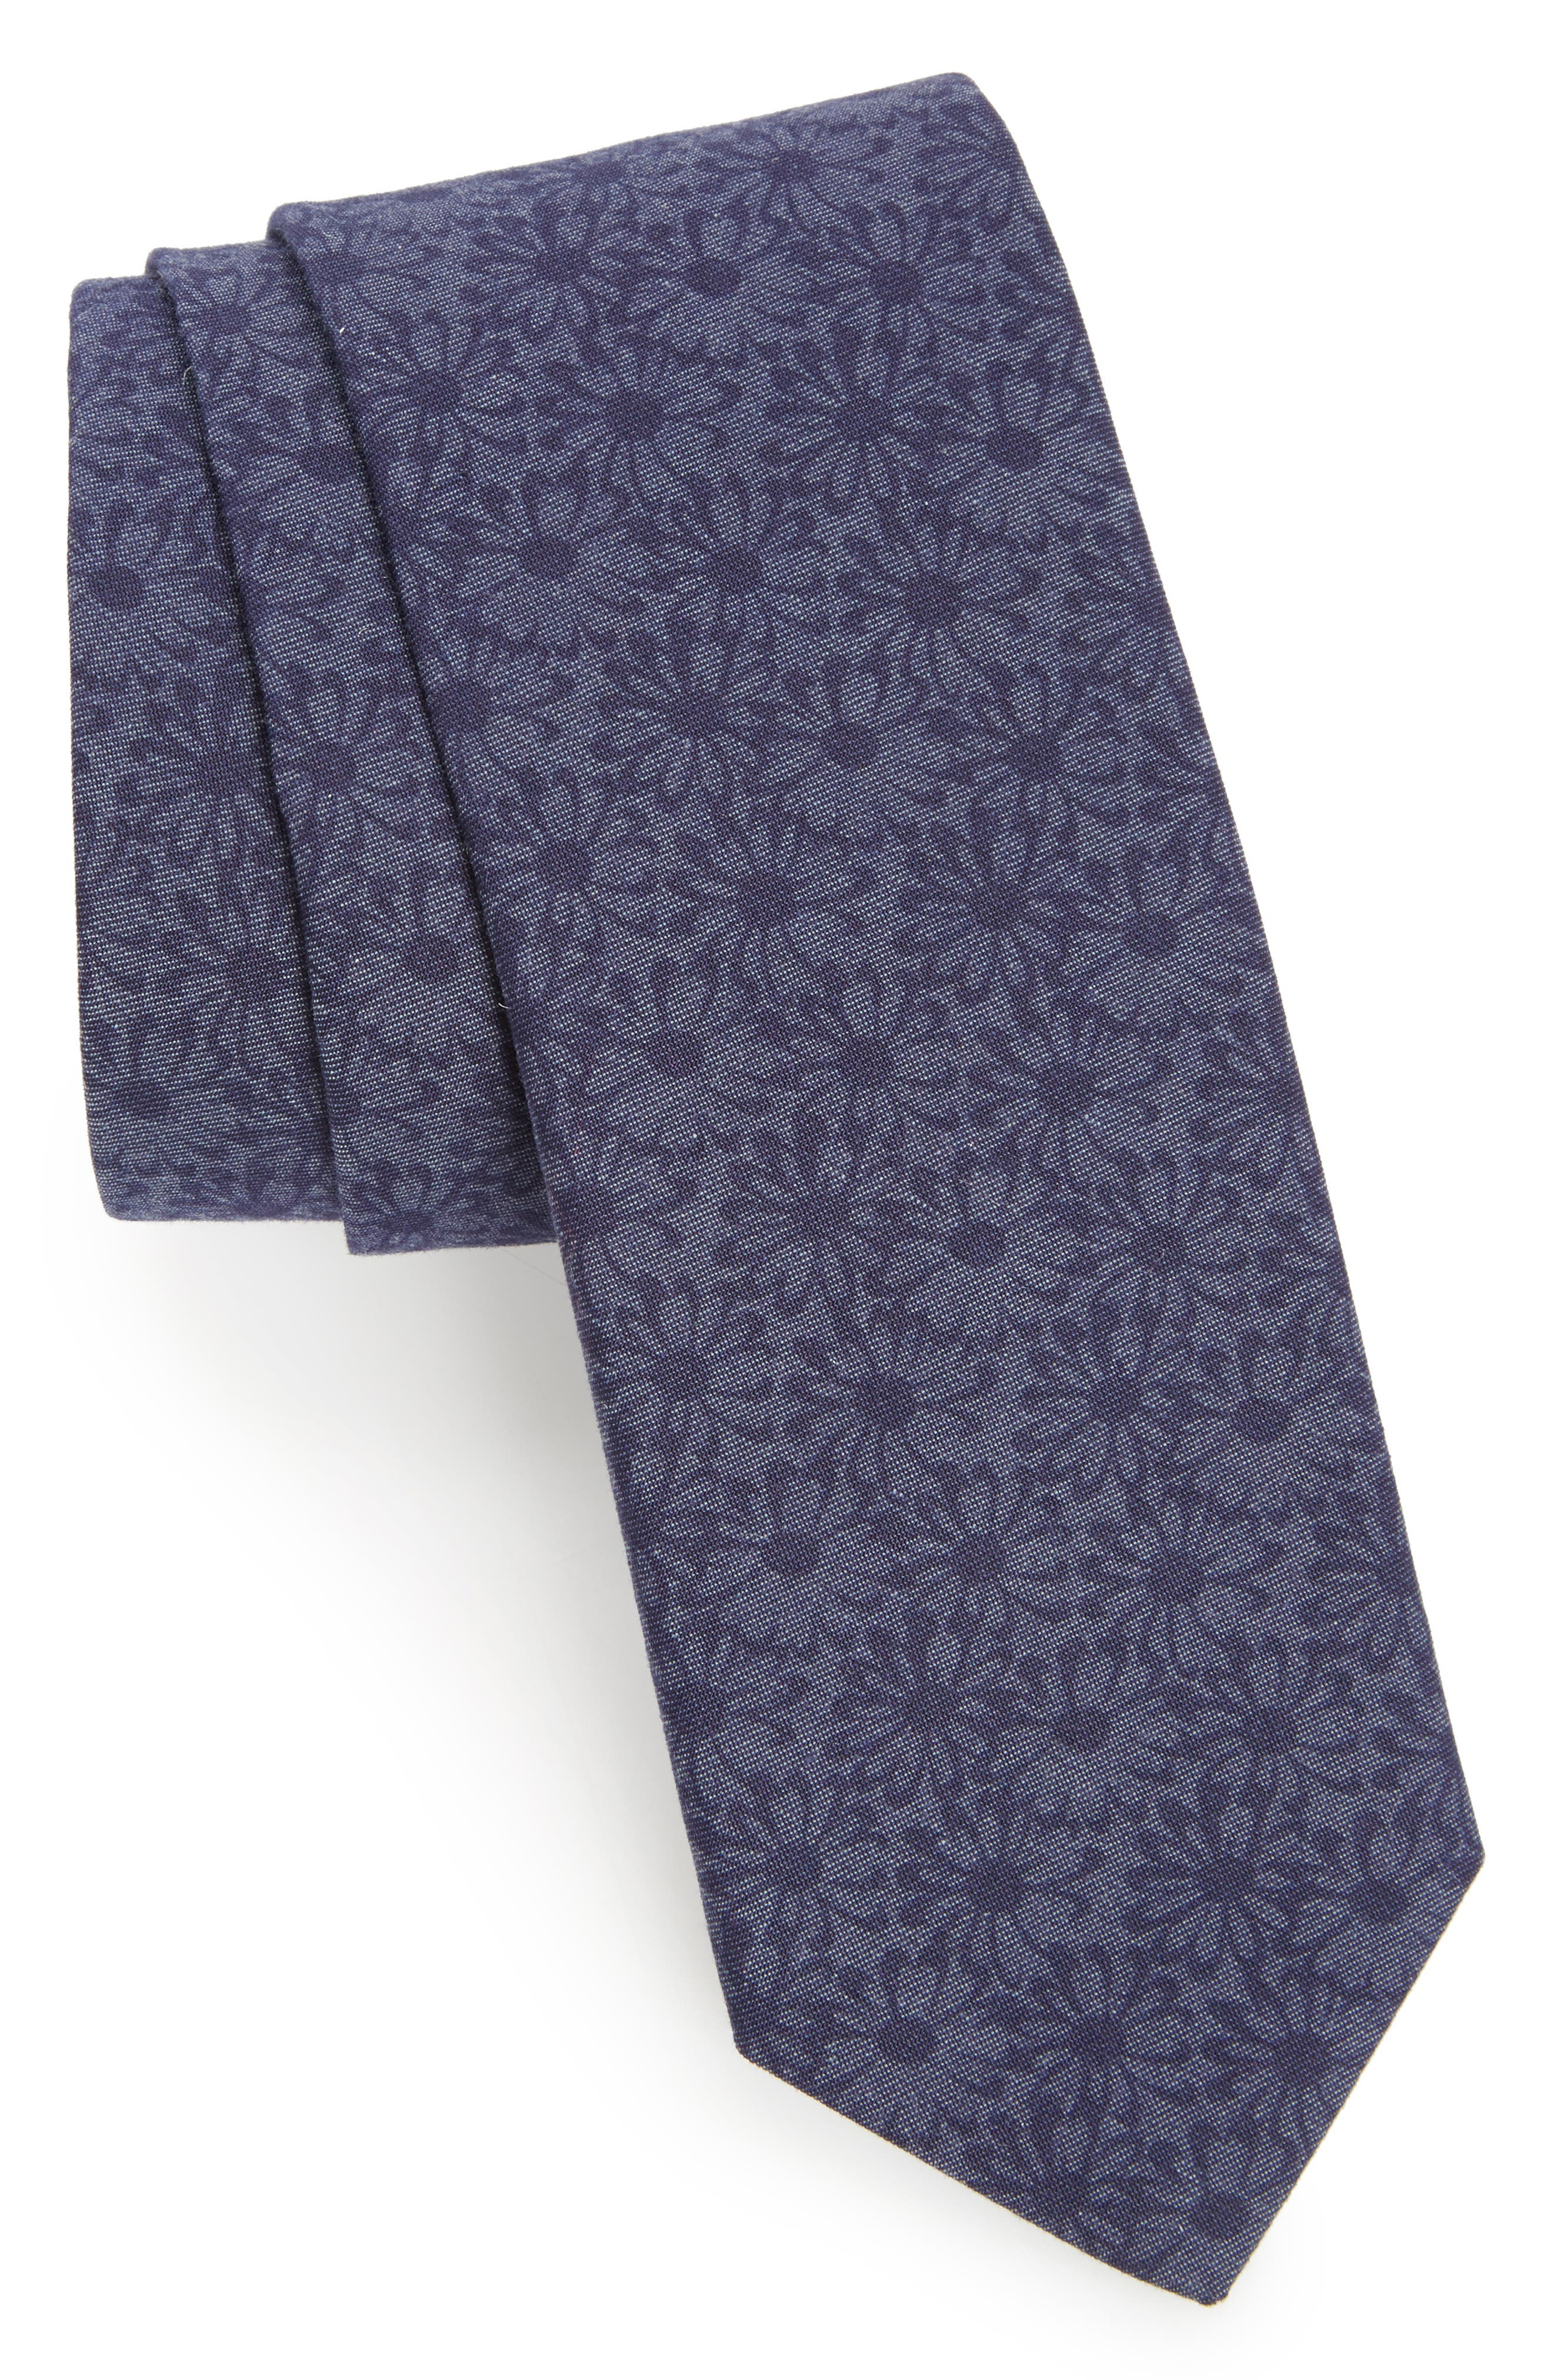 Floral Cotton Tie,                             Main thumbnail 1, color,                             Navy/ Daisy